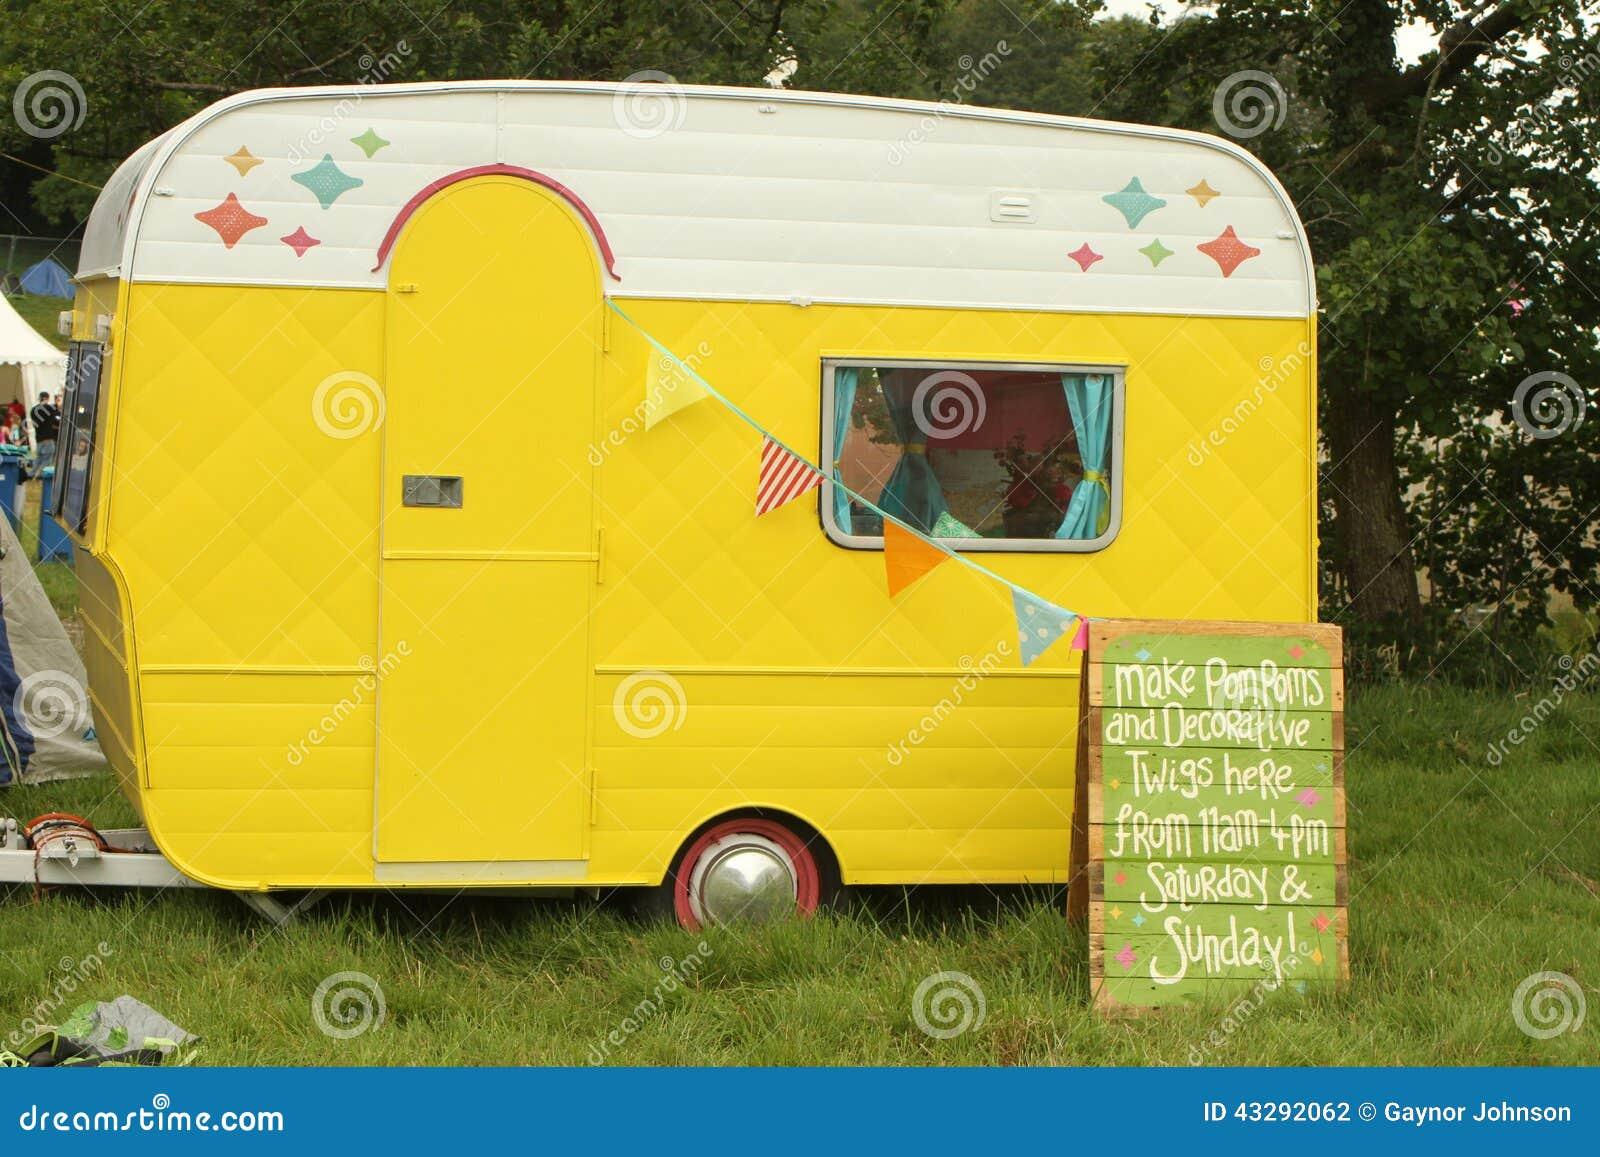 Caravane décorée | Grmf